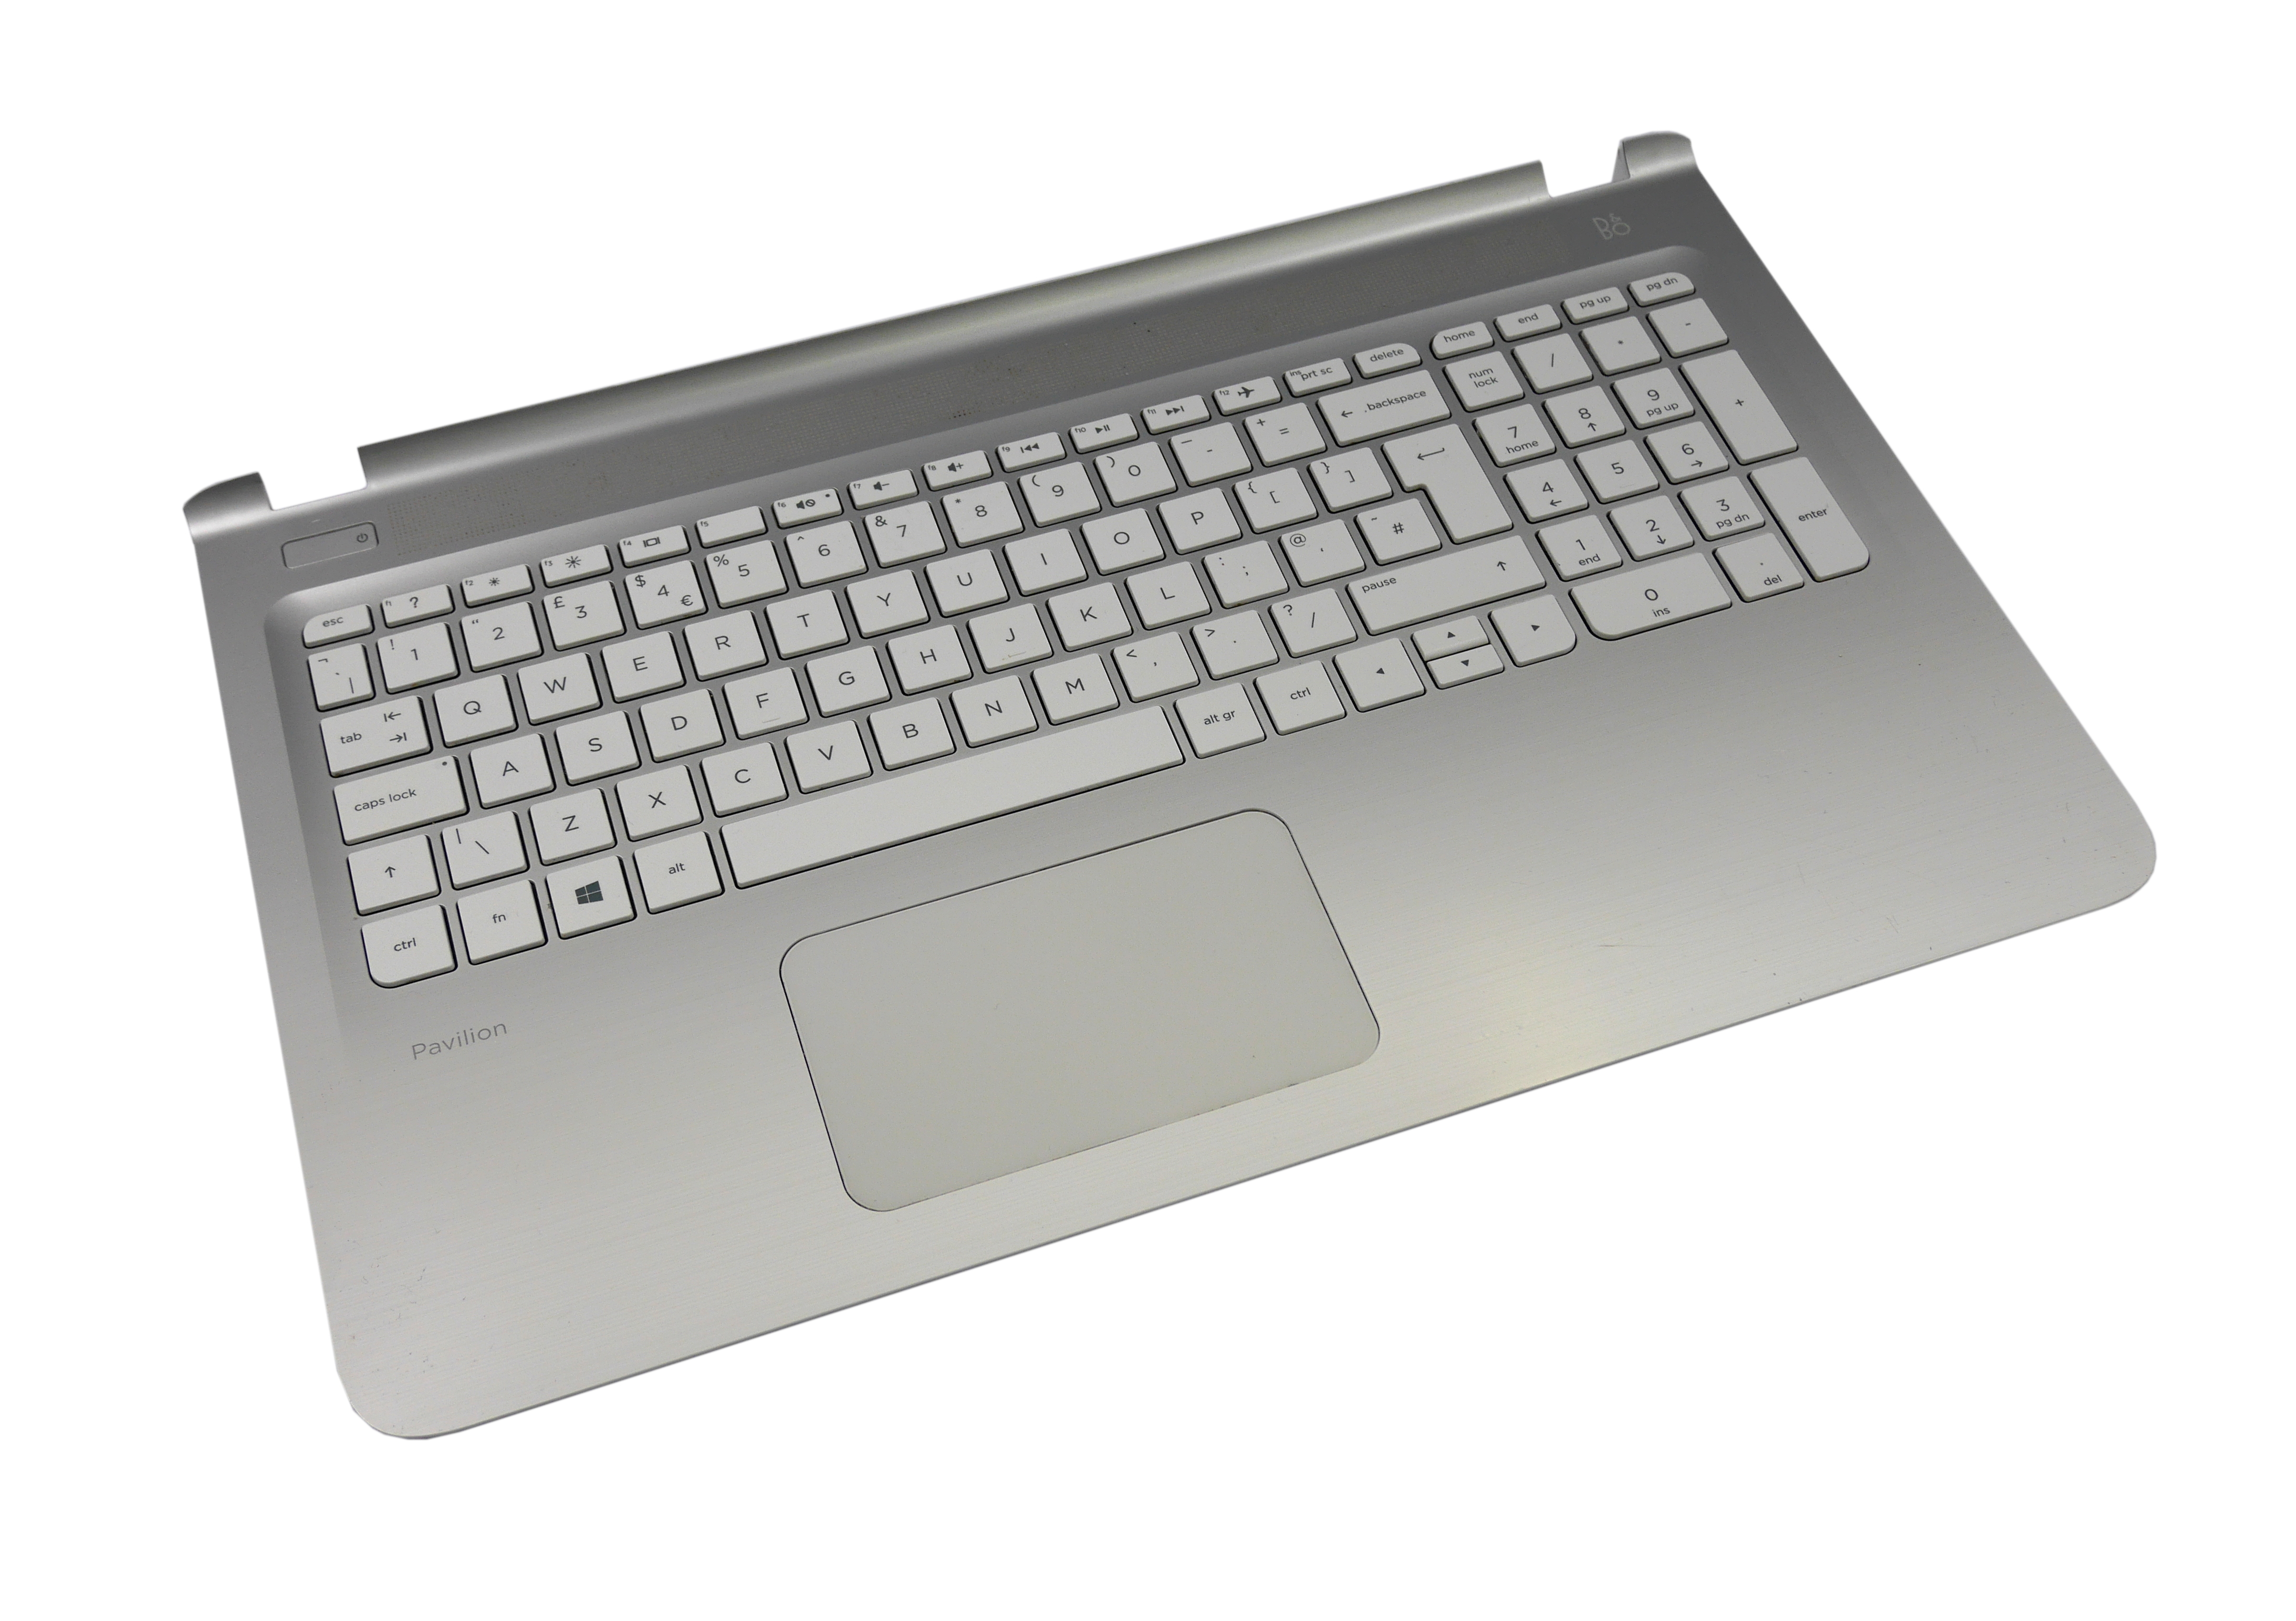 HP Pavilion 15 (15-ab048sa) UK Keyboard / Palmrest / Touchpad Assembly